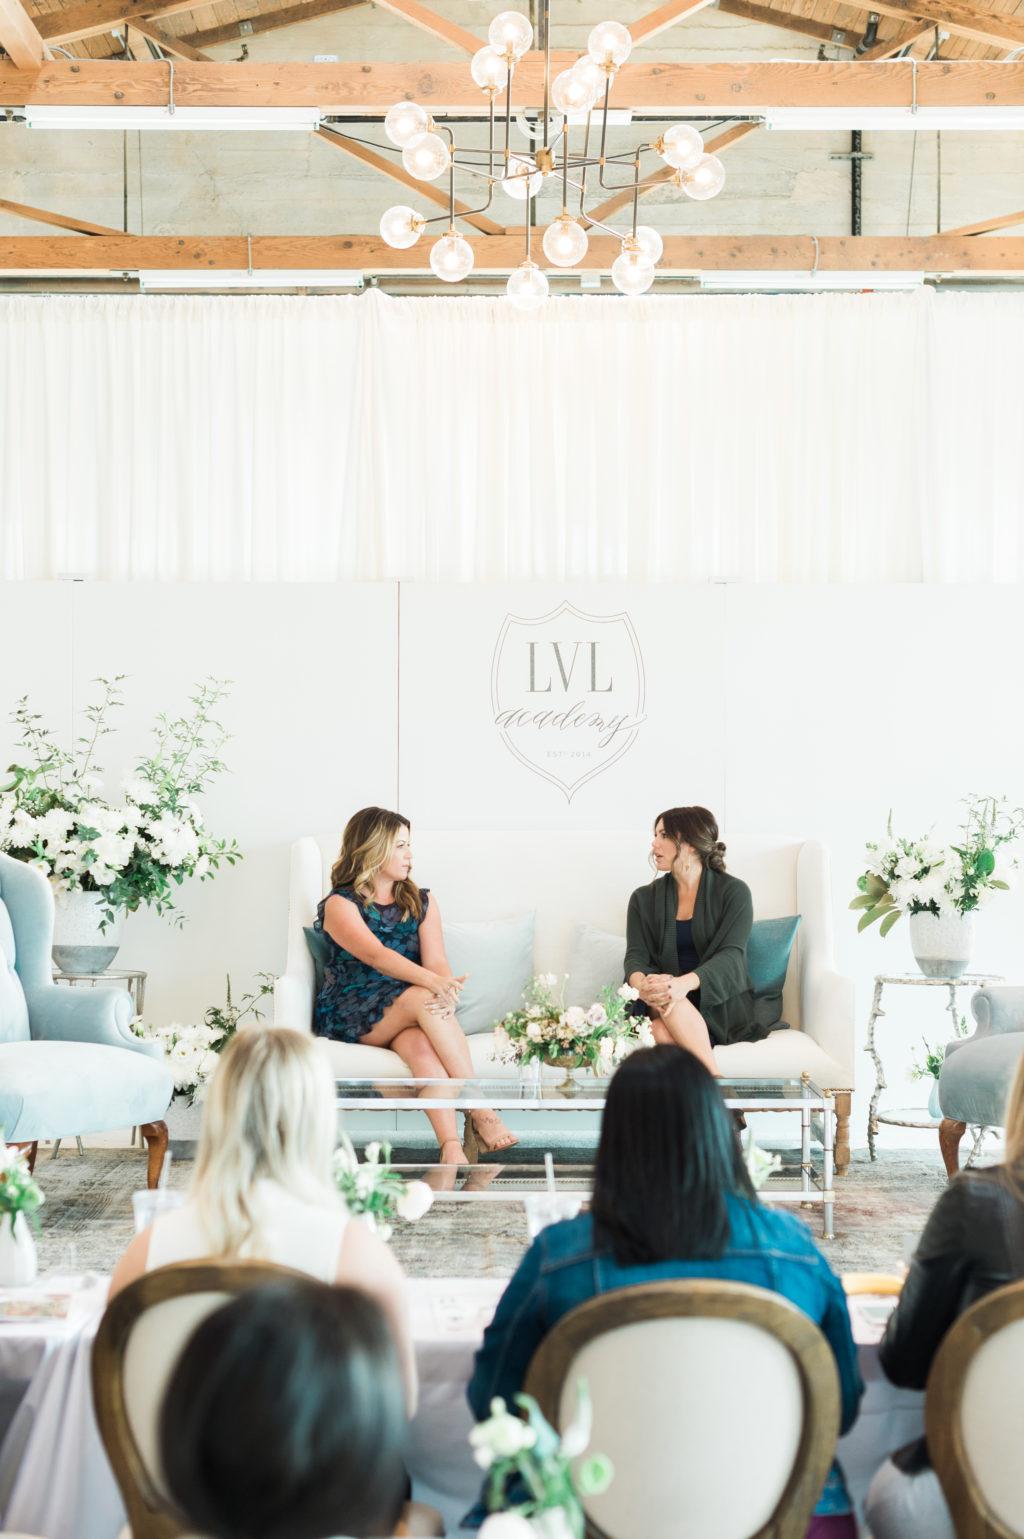 LVL Academy Wedding Planner Workshop in Orange County